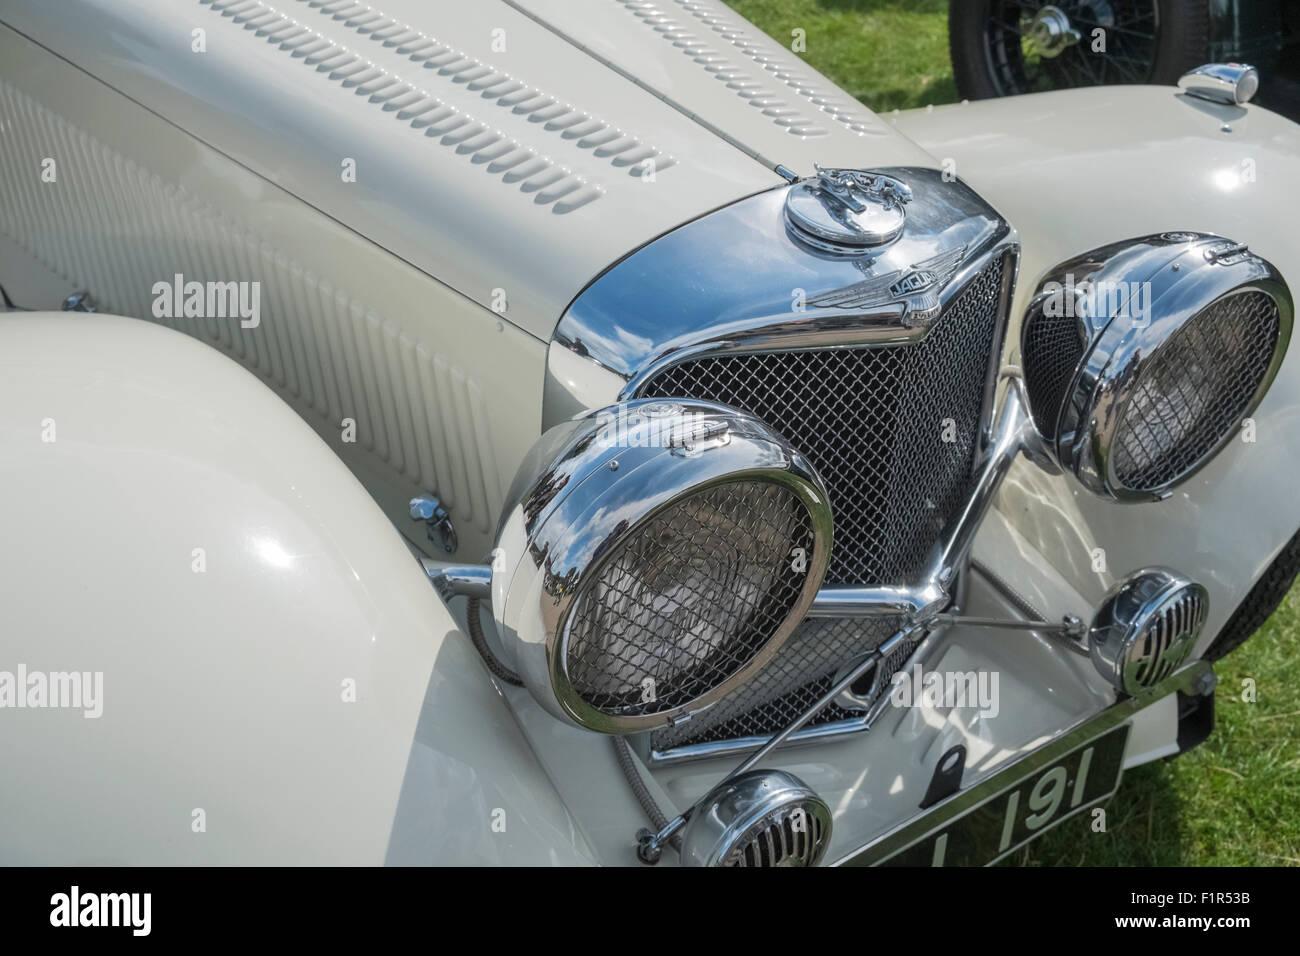 Vintage classic Jaguar car headlamps and radiator grille. - Stock Image